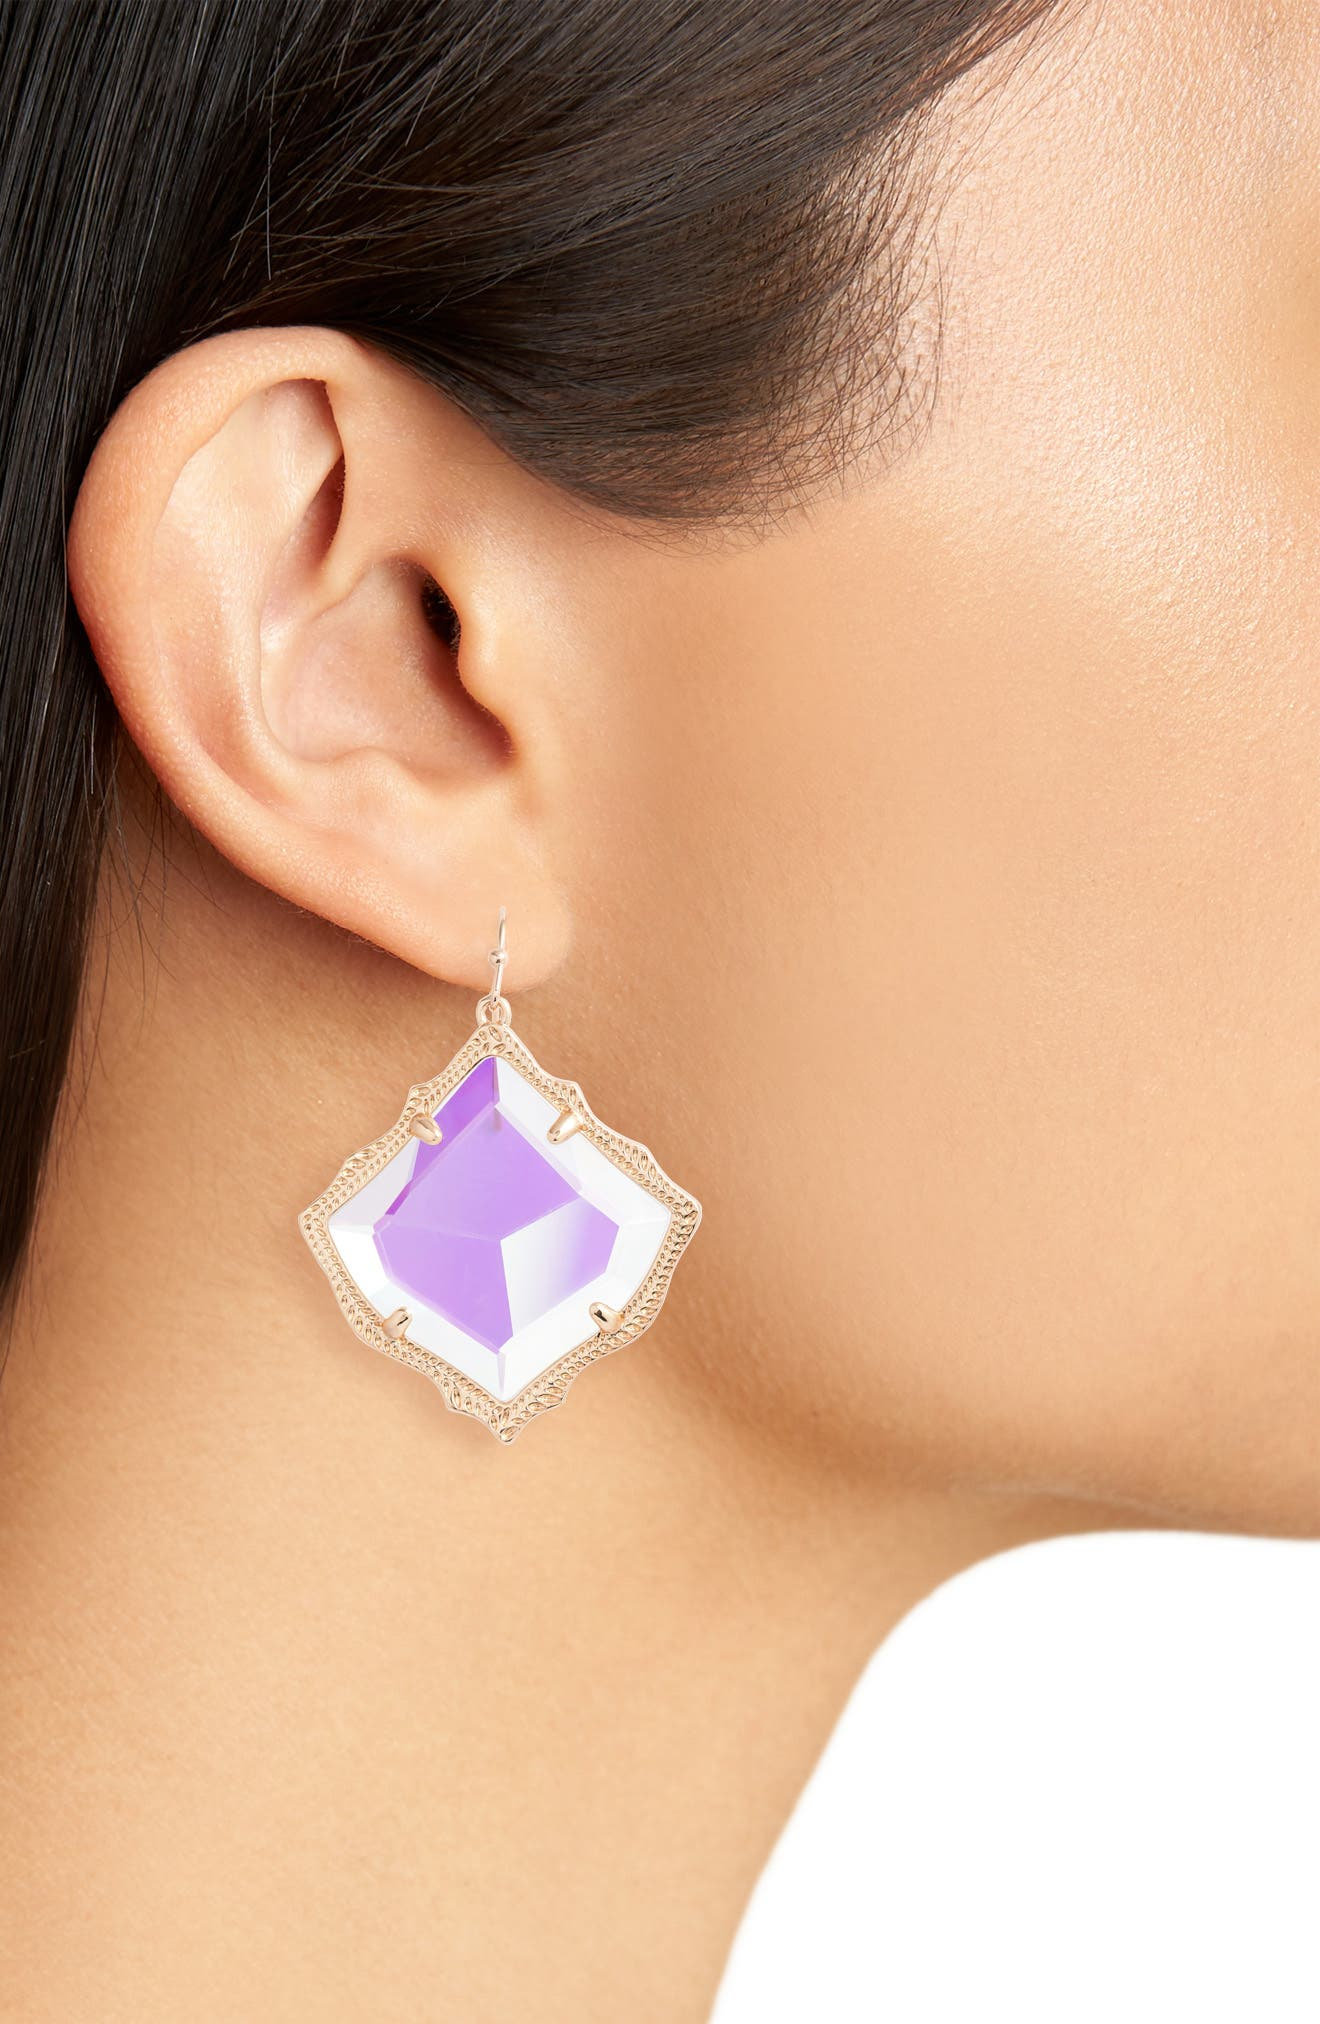 KENDRA SCOTT, Kirsten Drop Earrings, Alternate thumbnail 2, color, DICHROIC GLASS/ ROSE GOLD